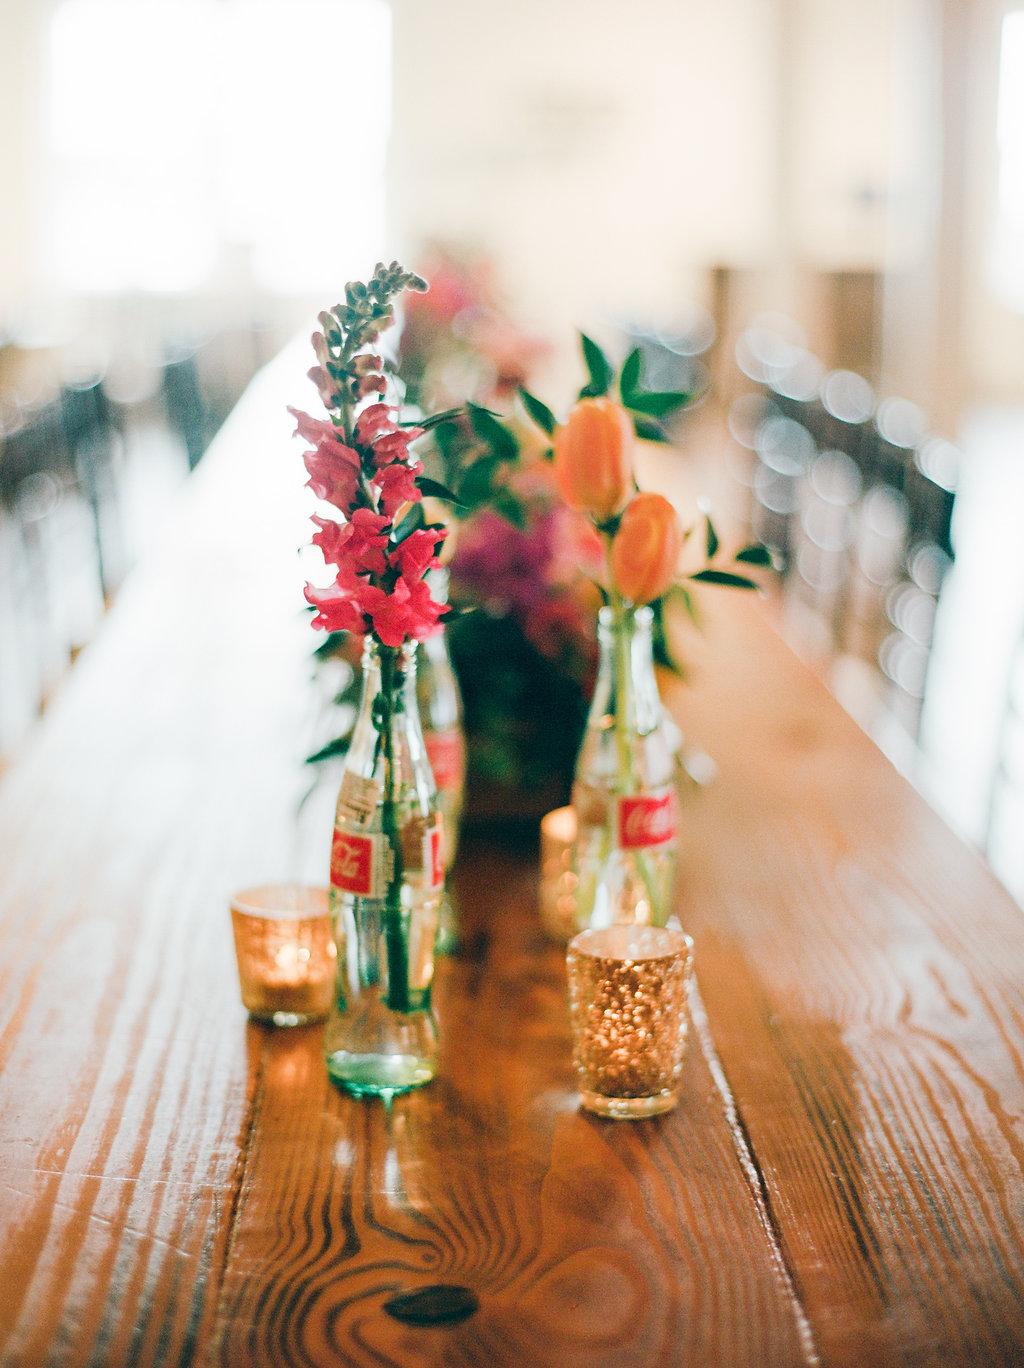 Coke bottle wedding centerpieces - https://ruffledblog.com/modern-playful-texas-carnival-wedding